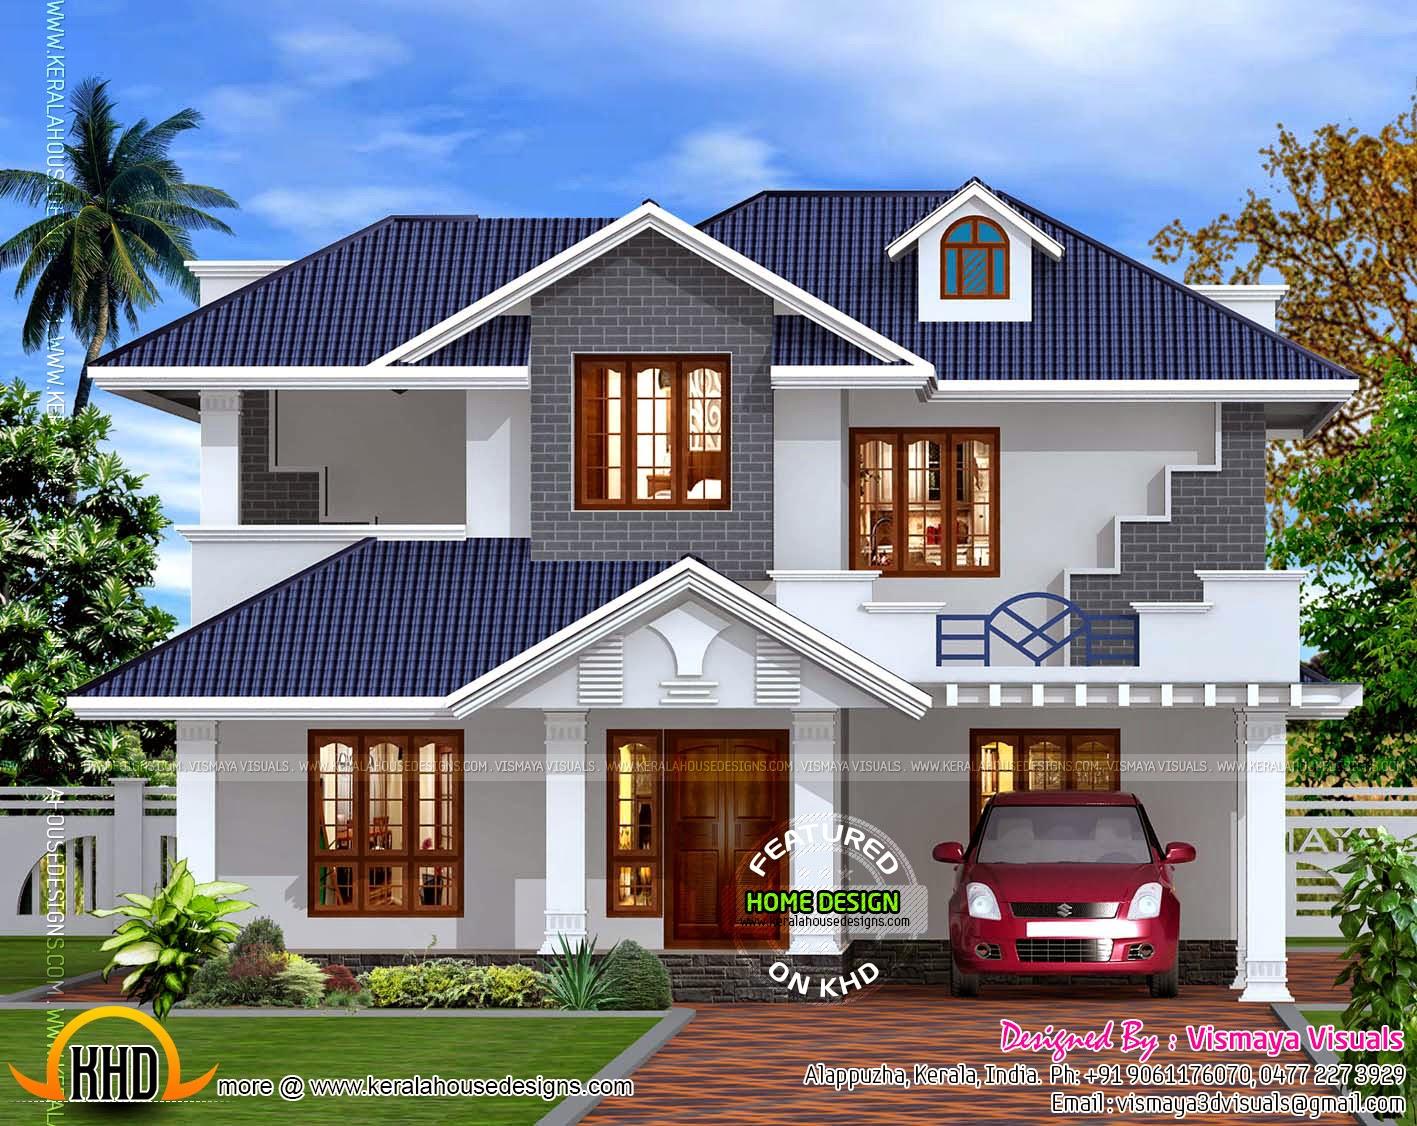 Kerala style villa exterior - Kerala home design and floor ...